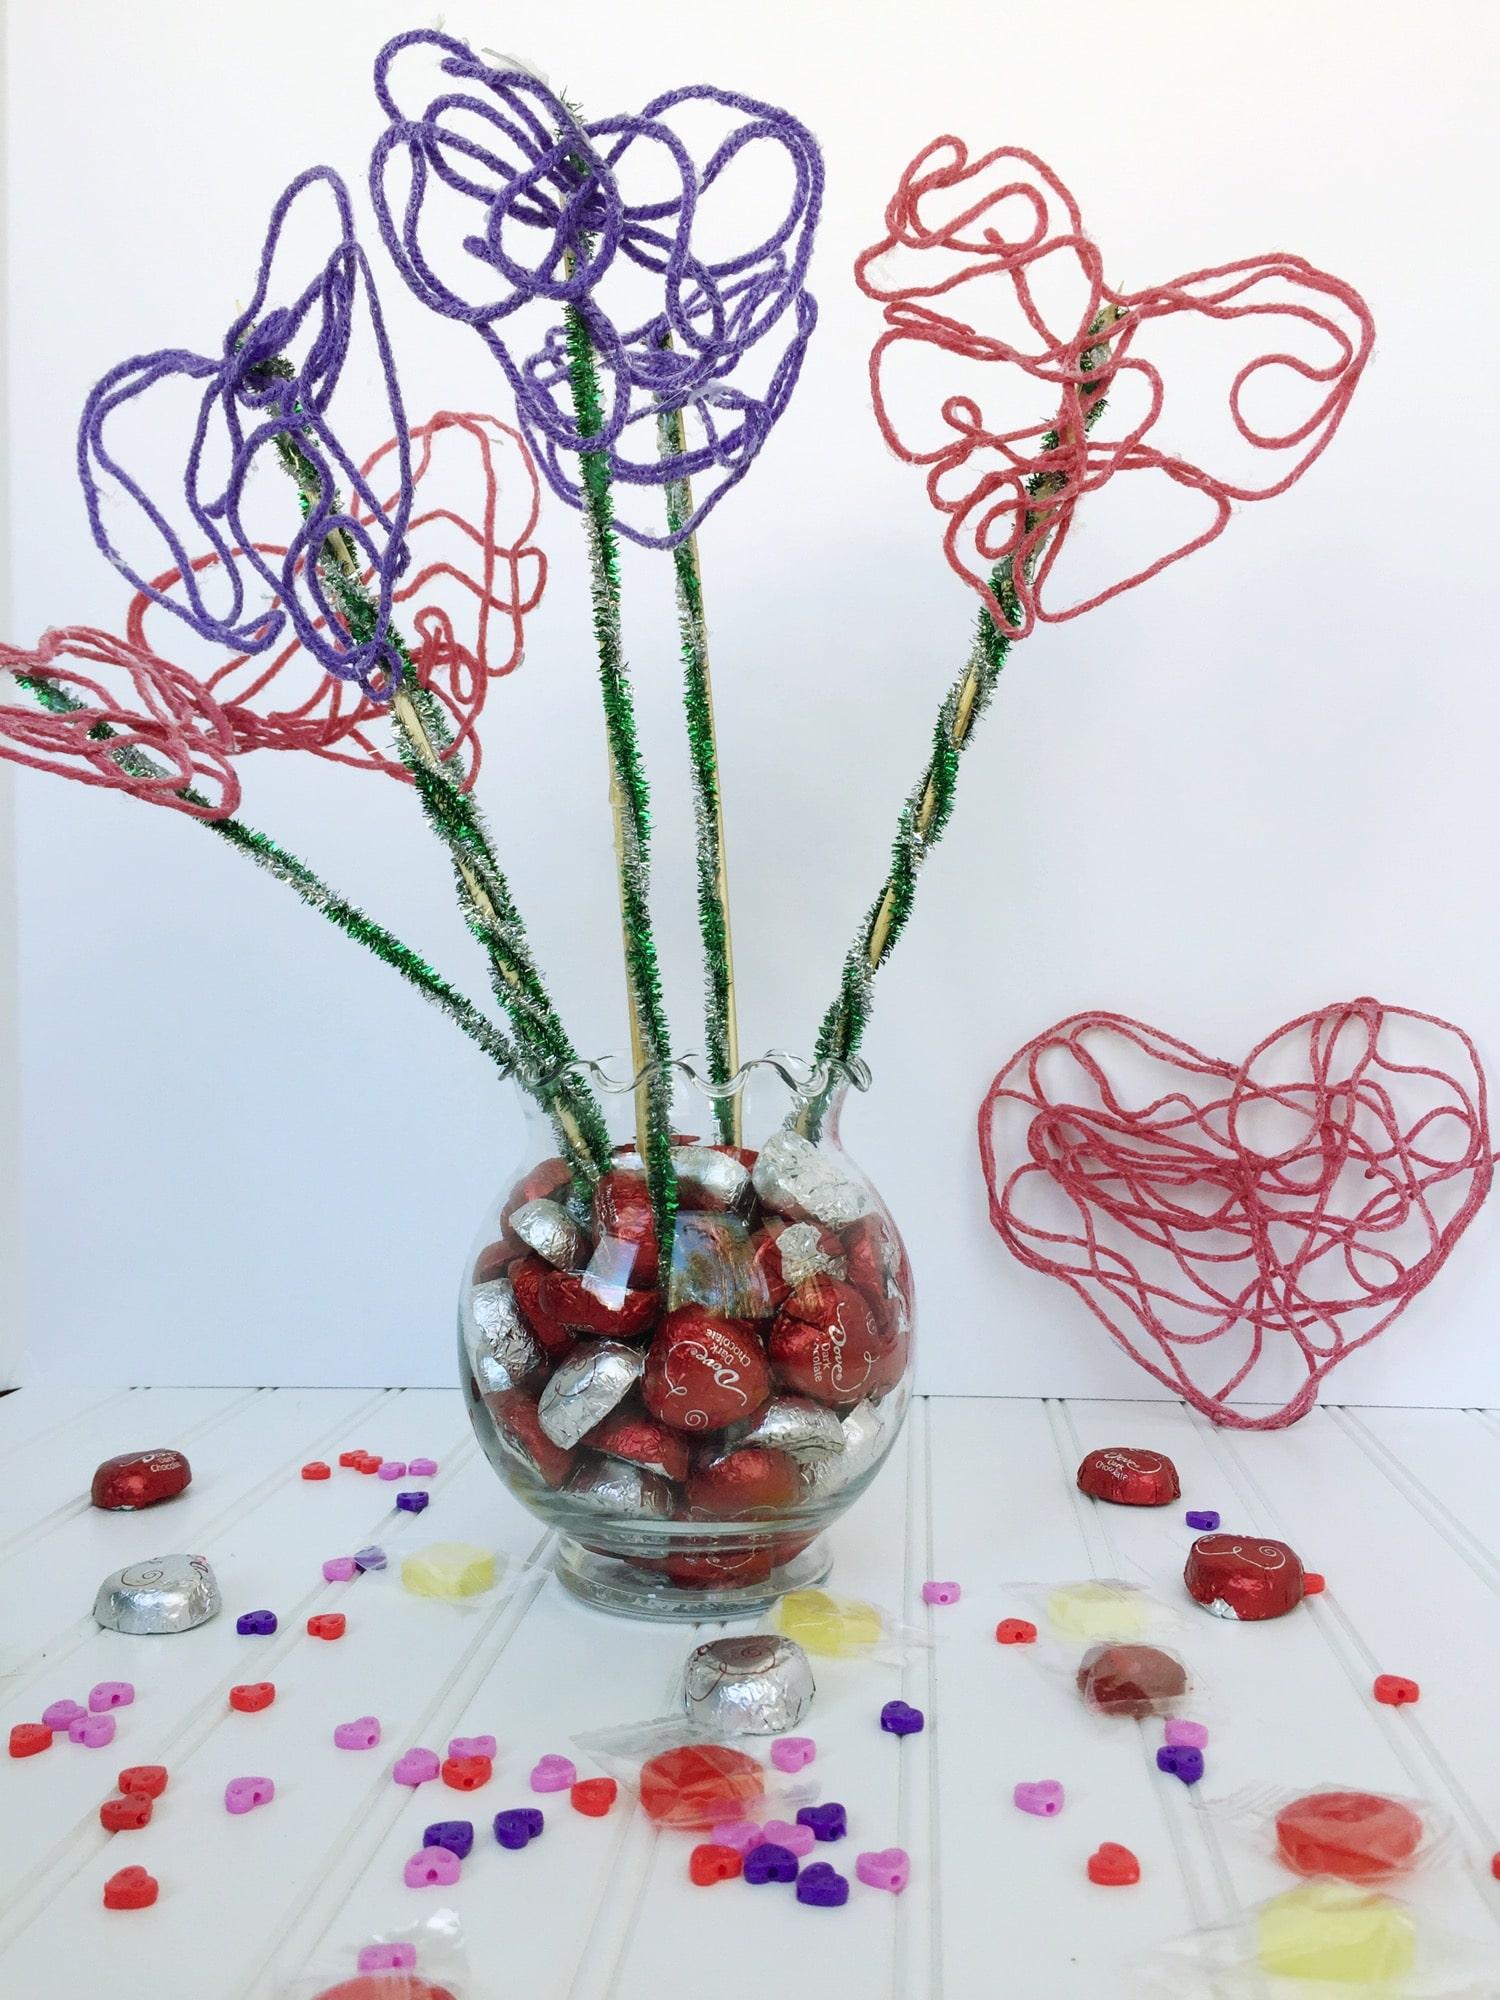 Creative galaxy yarn heart centerpiece bouquet final